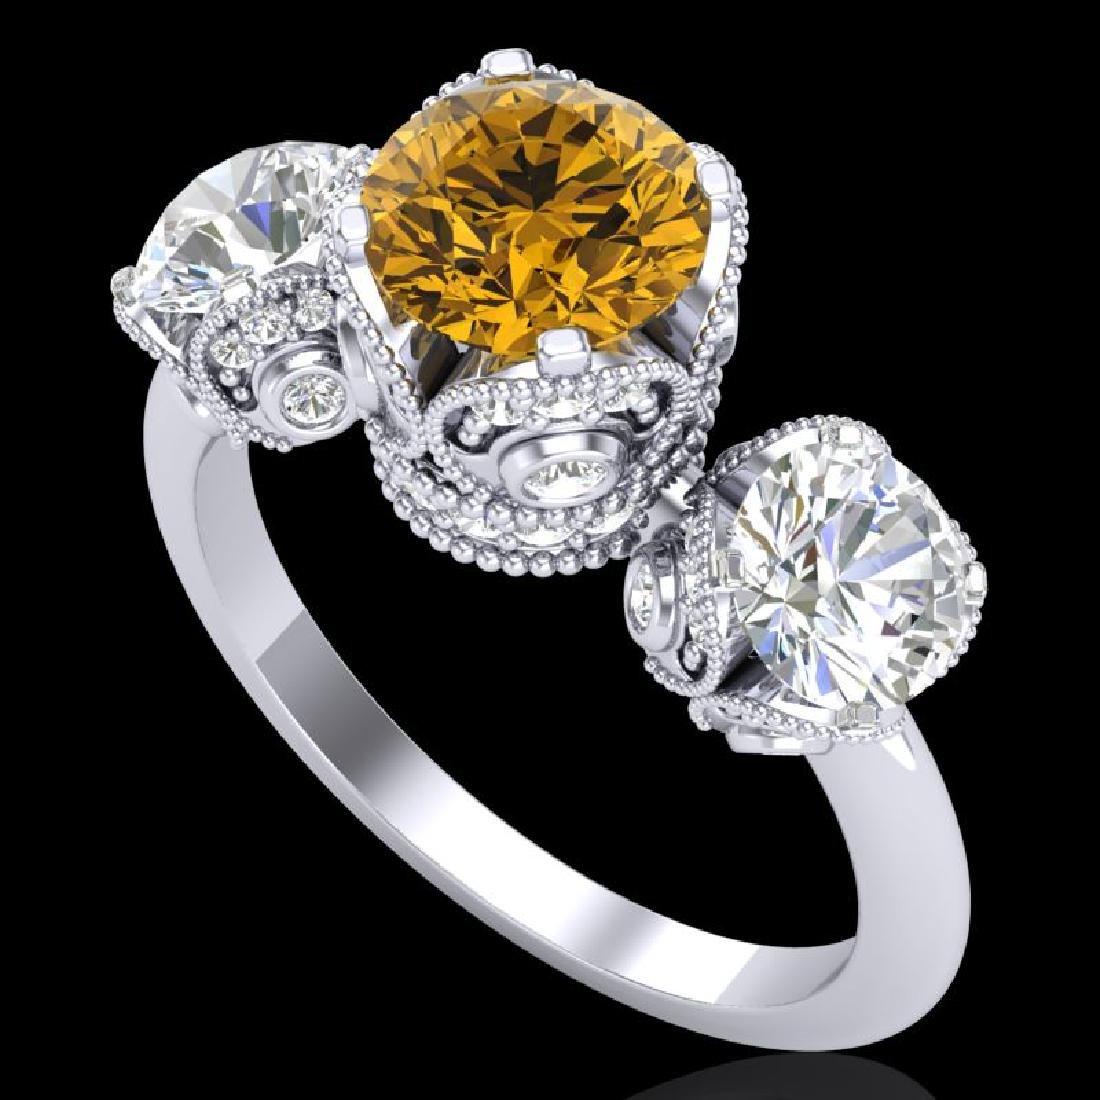 3 CTW Intense Yellow Diamond Solitaire Art Deco 3 Stone